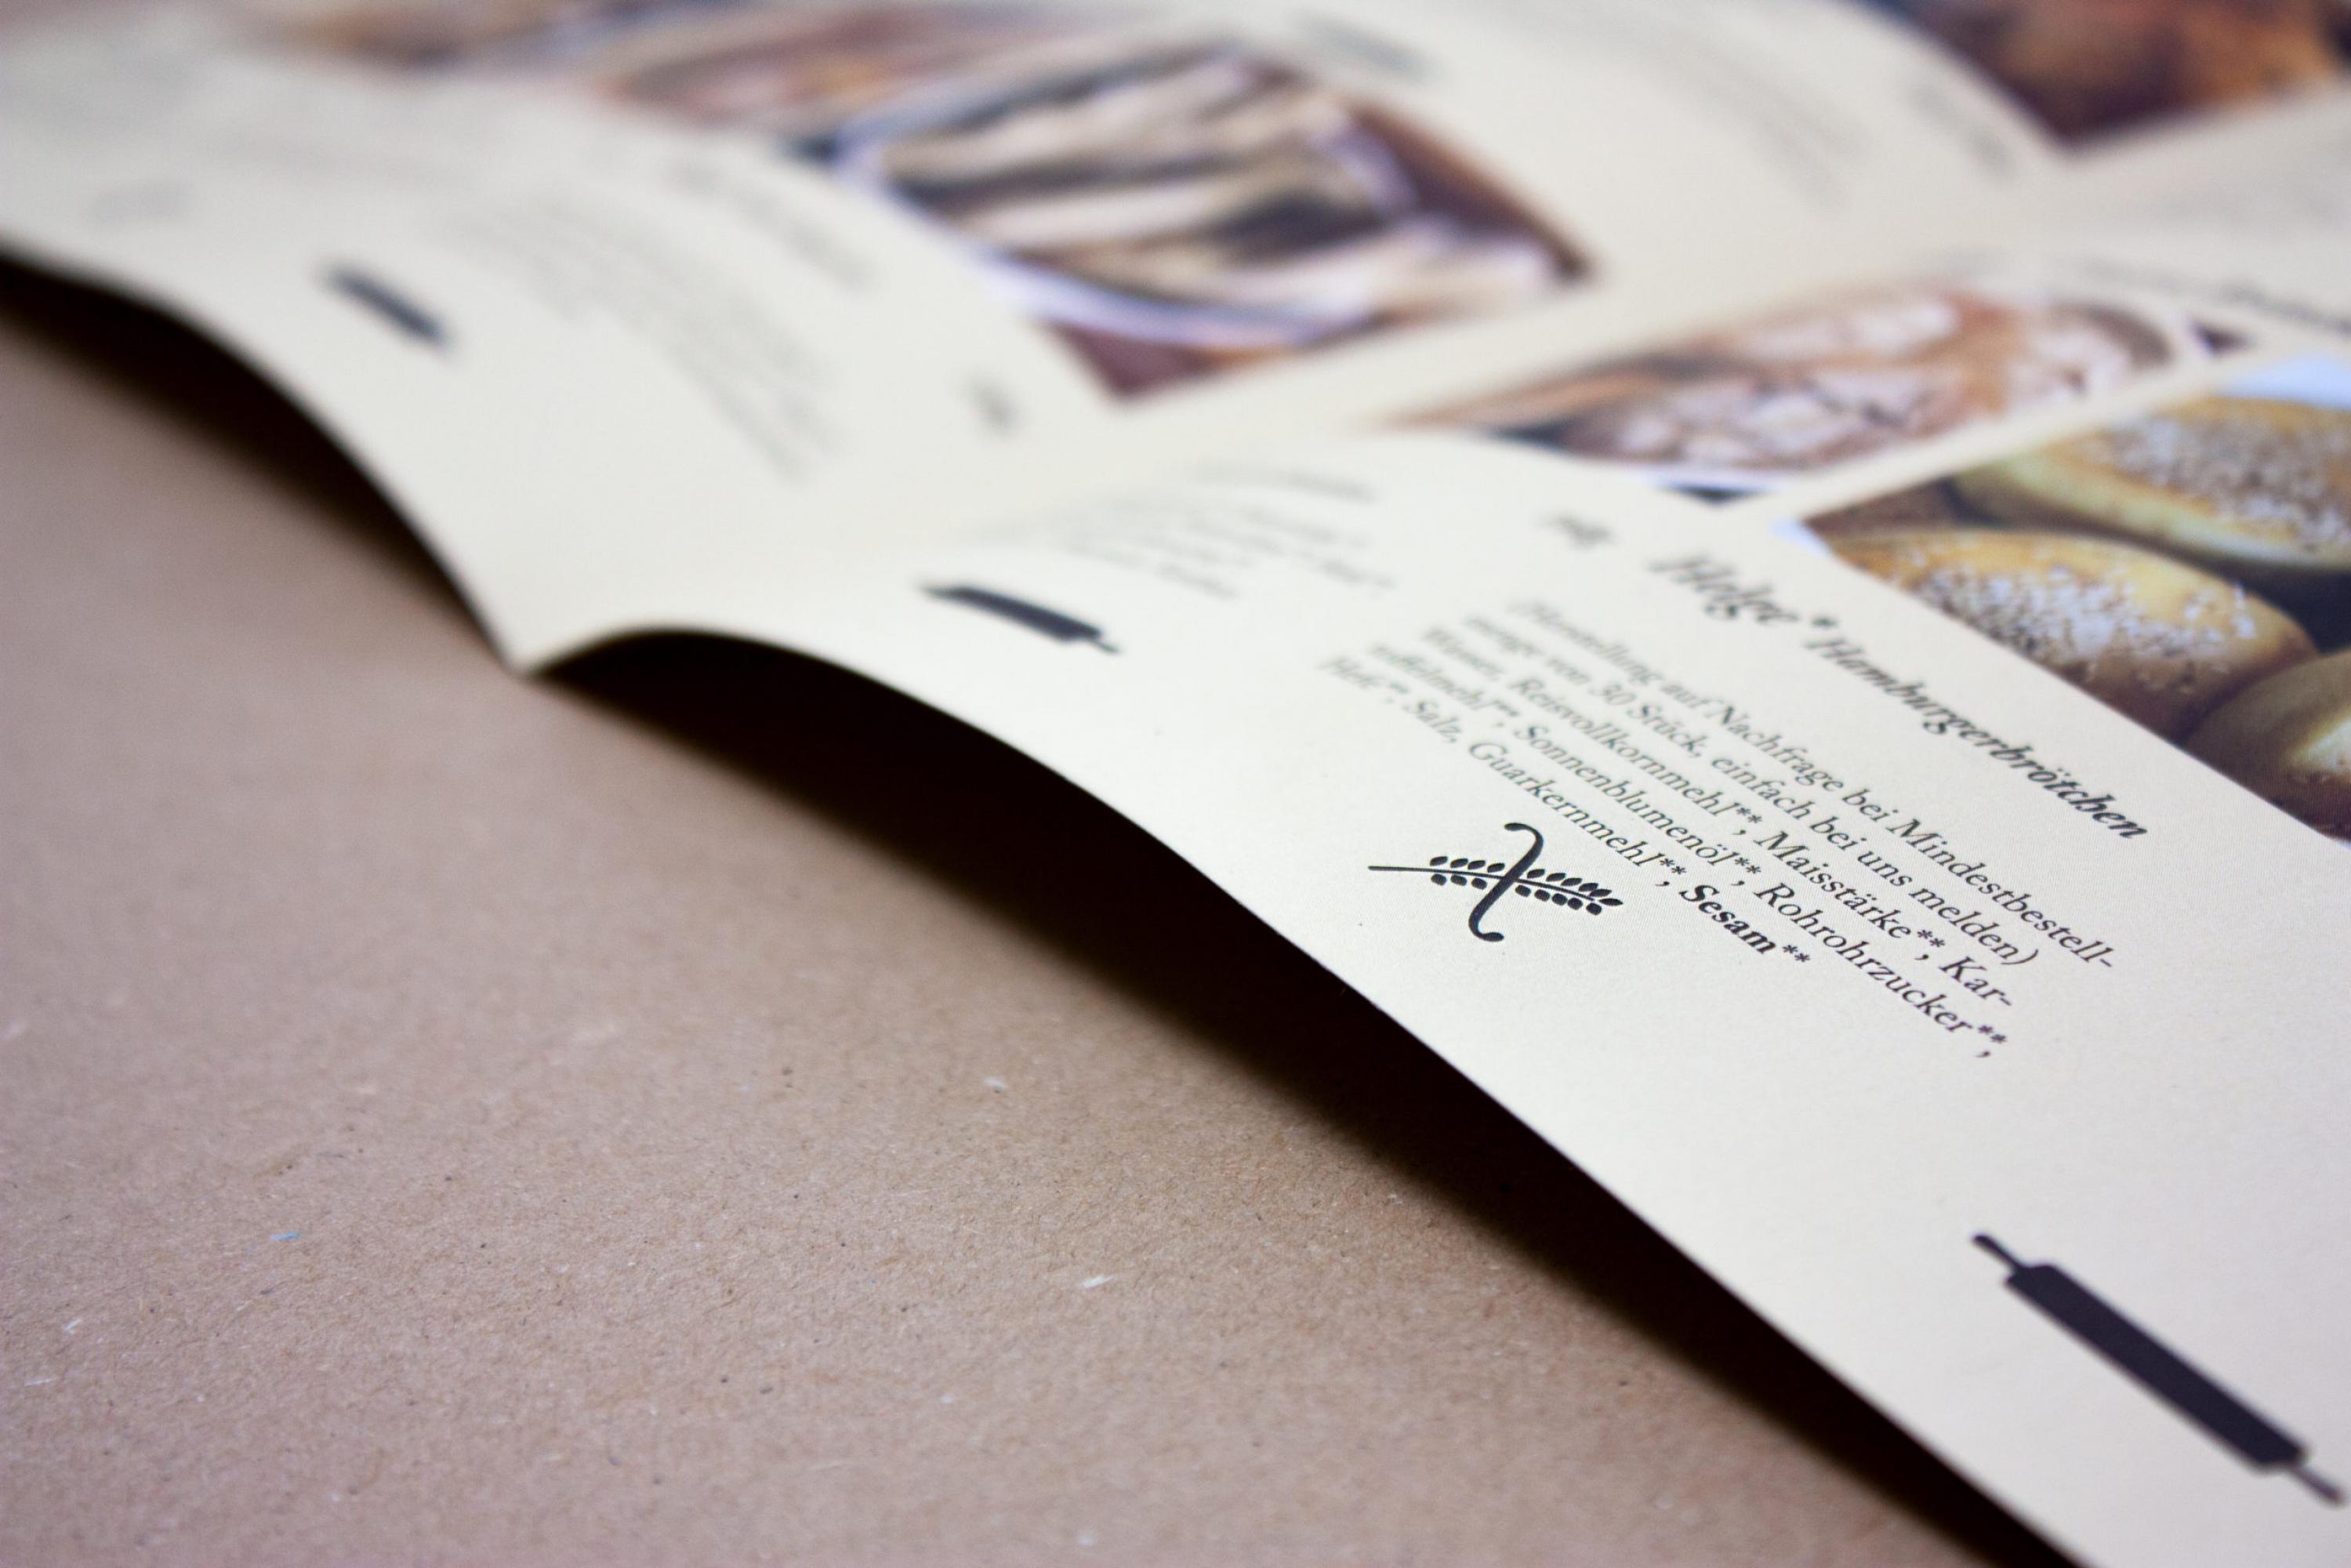 Print-broschuere-jute-baeckerei-formlos-corporate-design-3